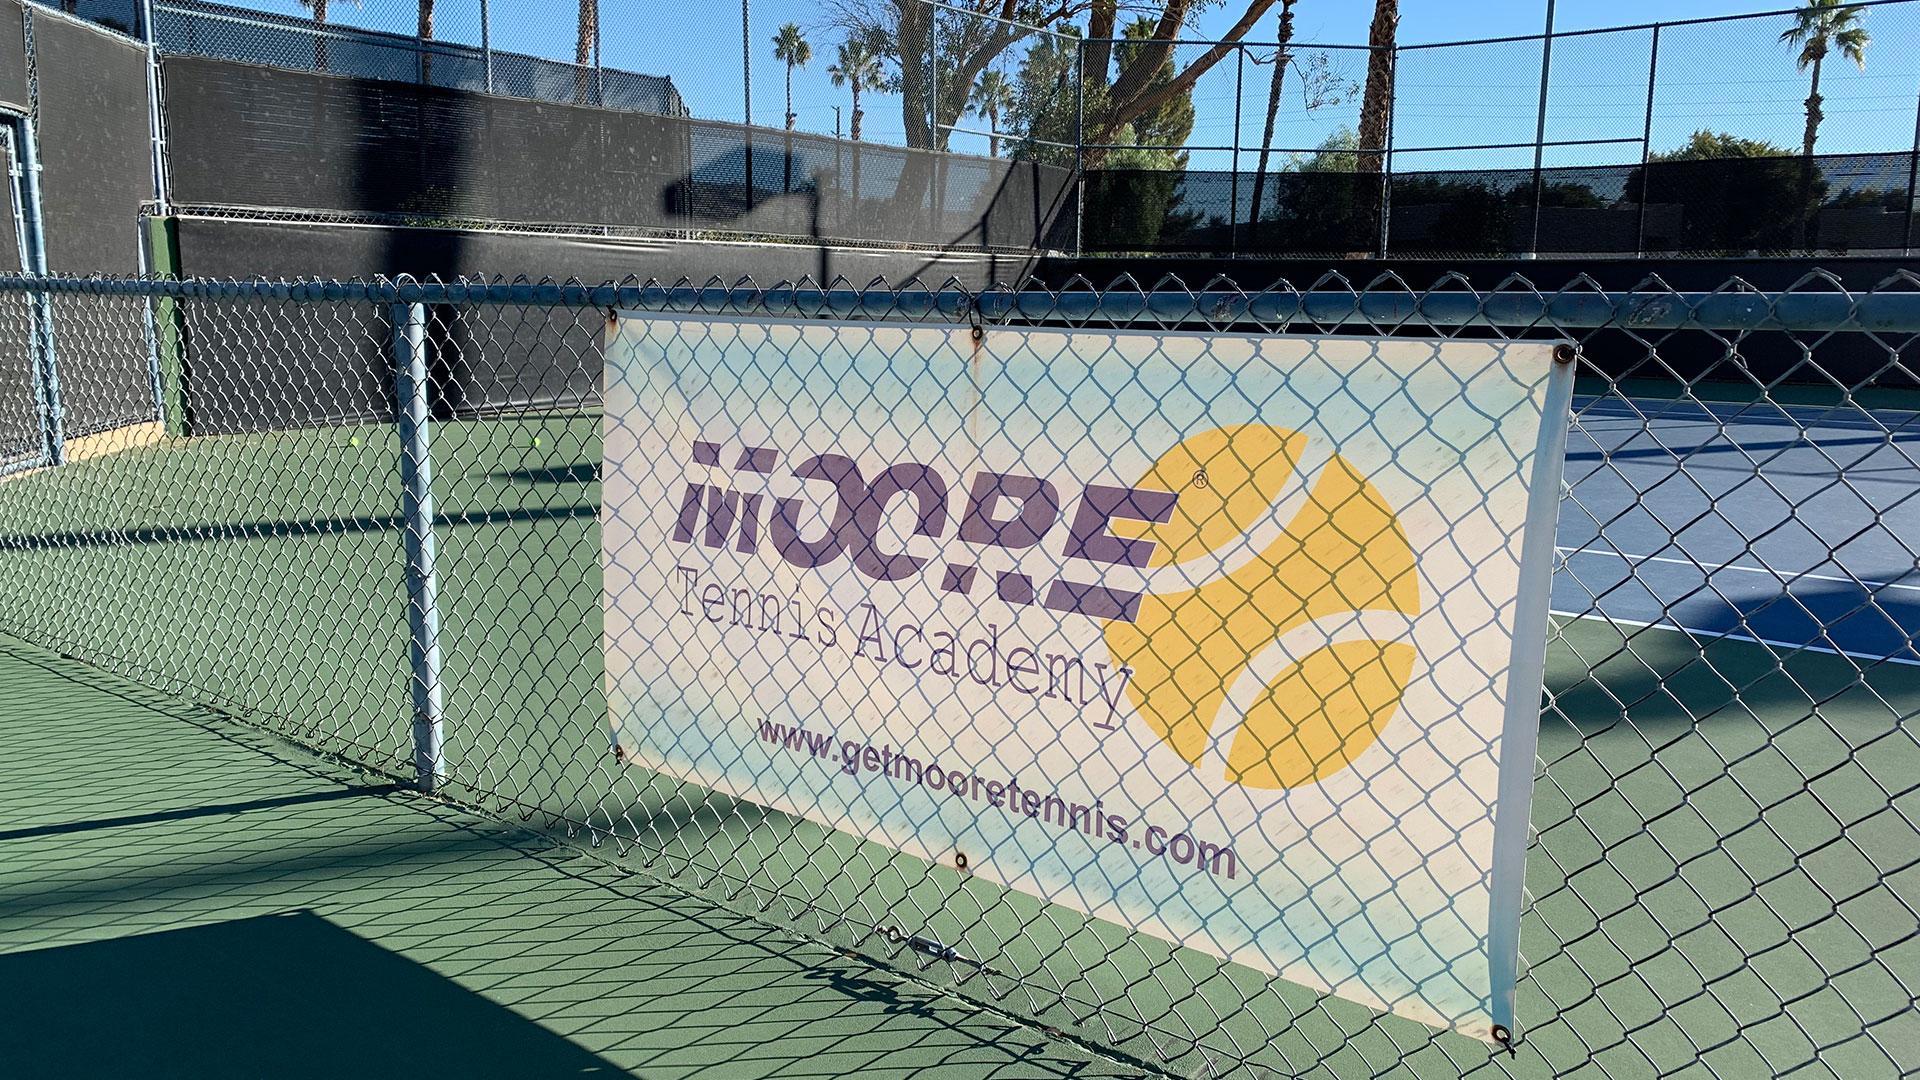 Moore Tennis Academy